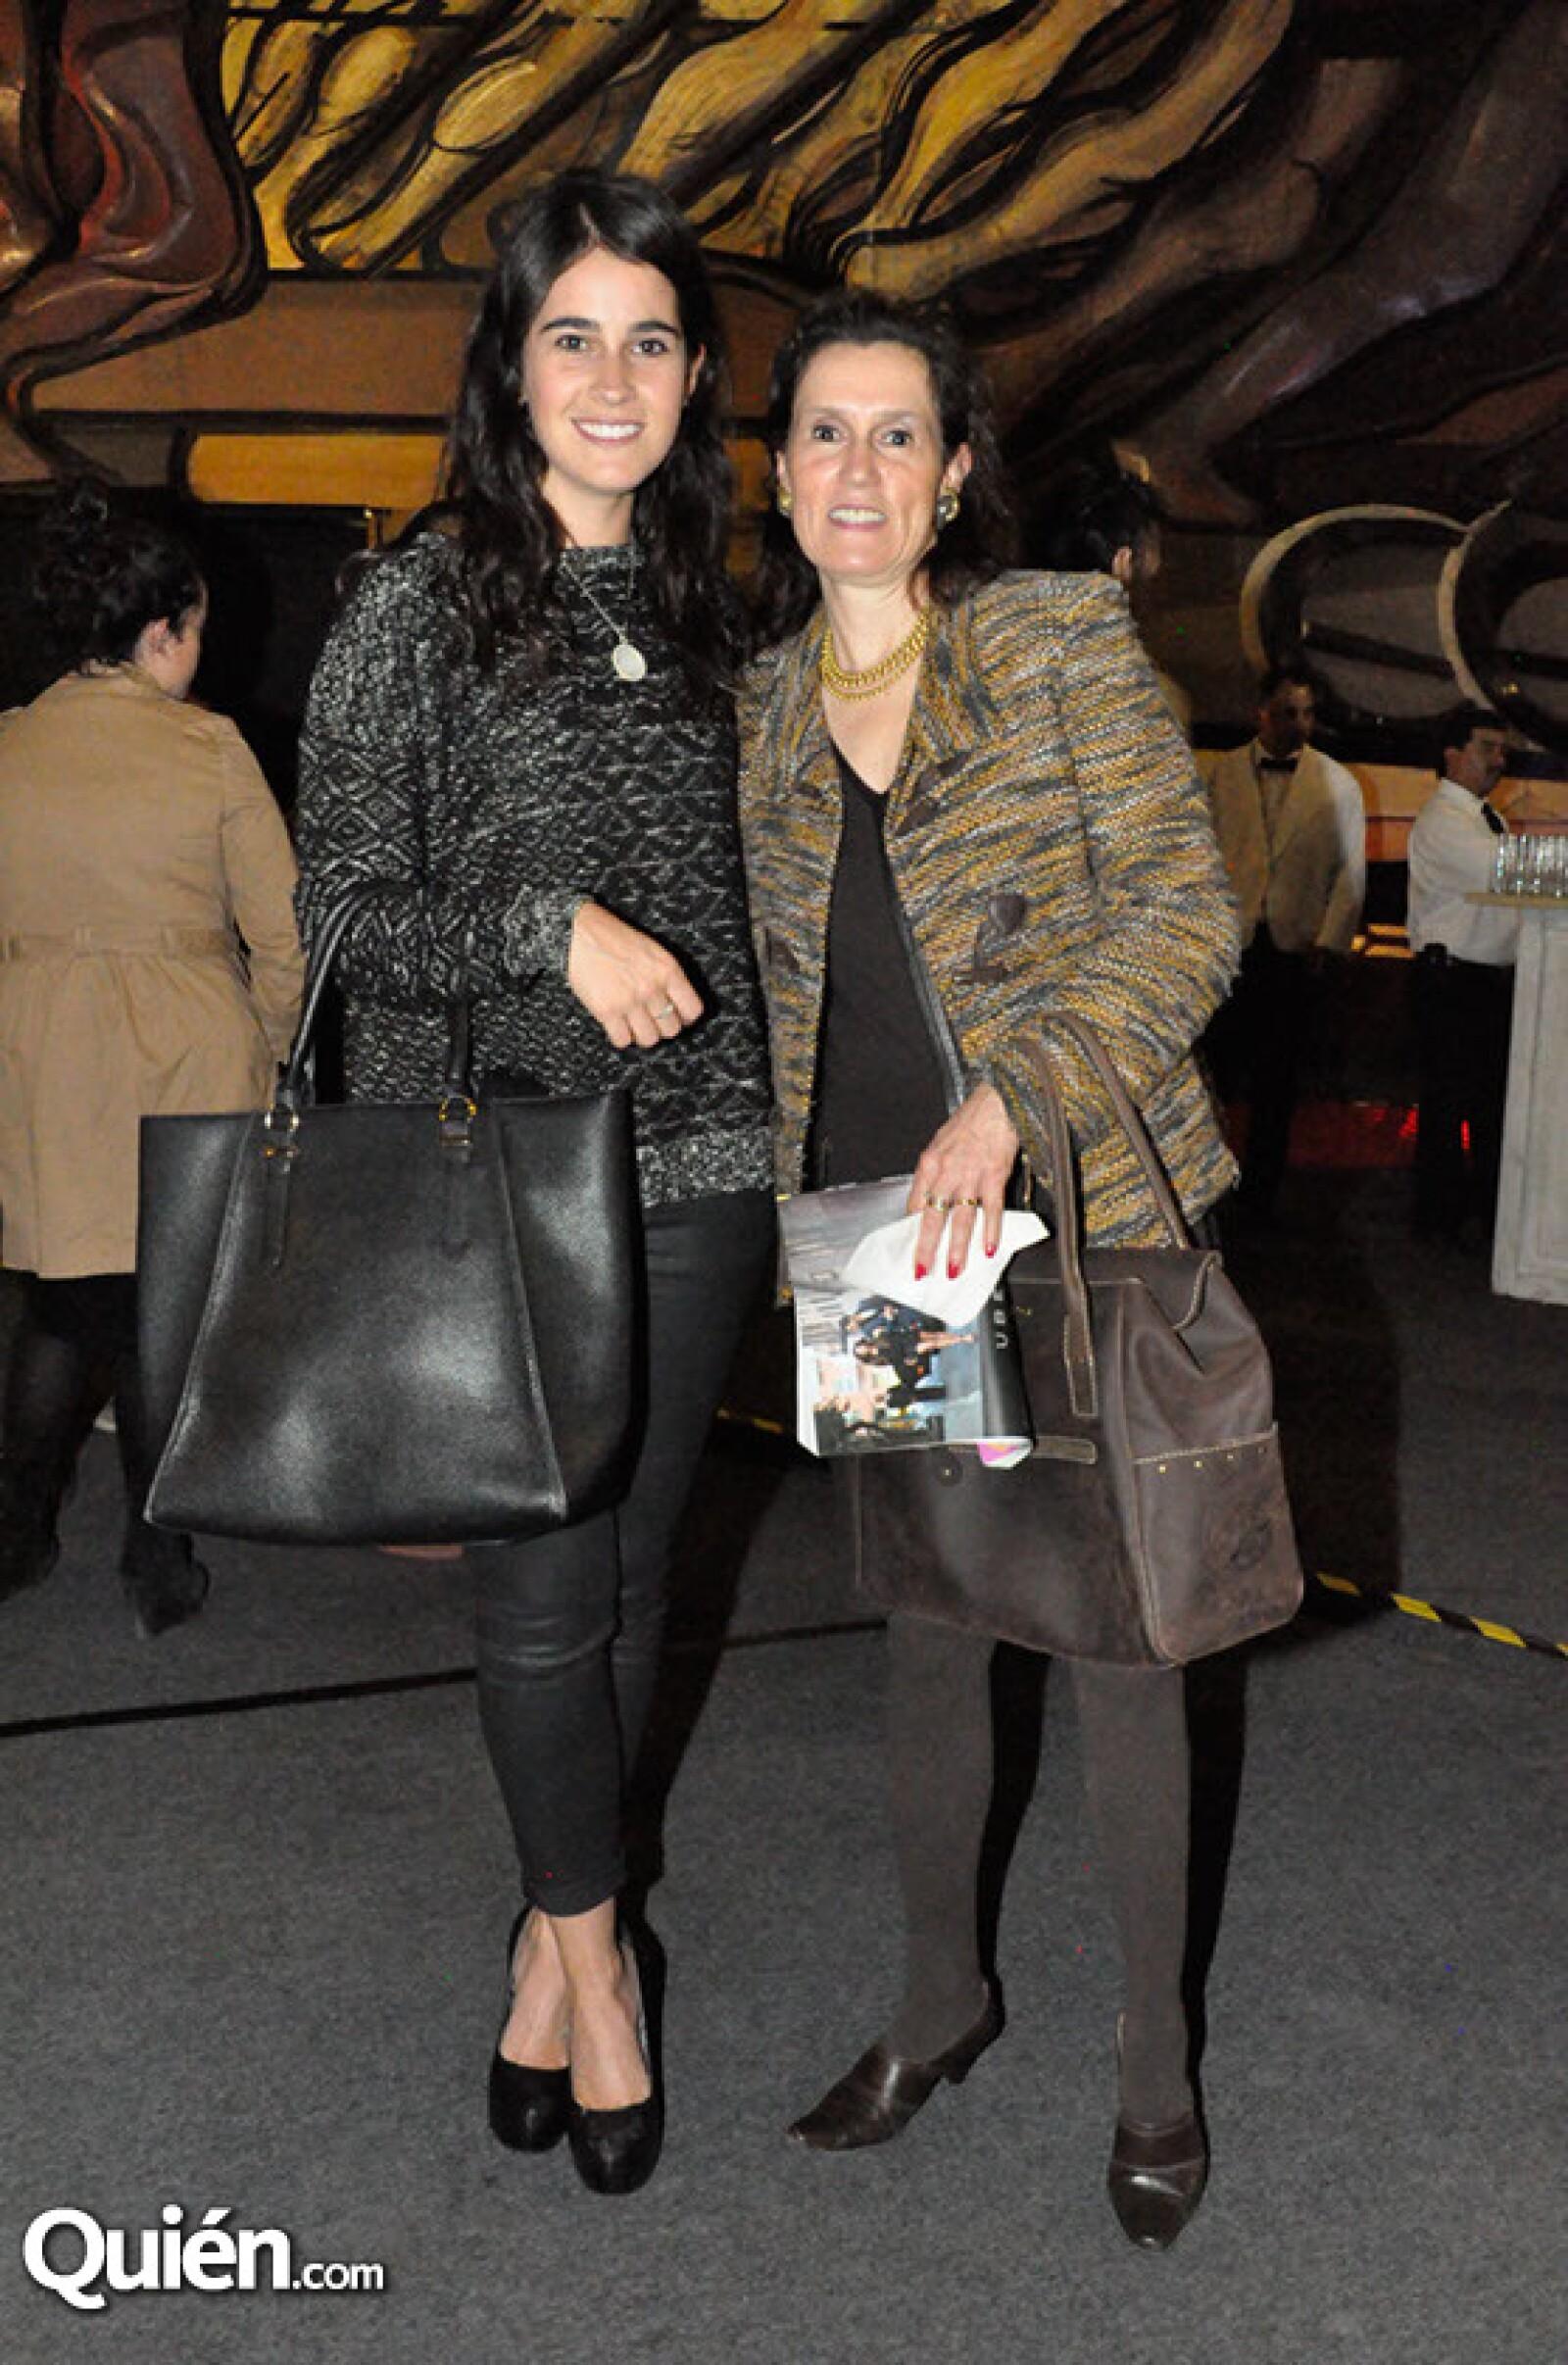 Fernanda Serrano y Laura Carrera